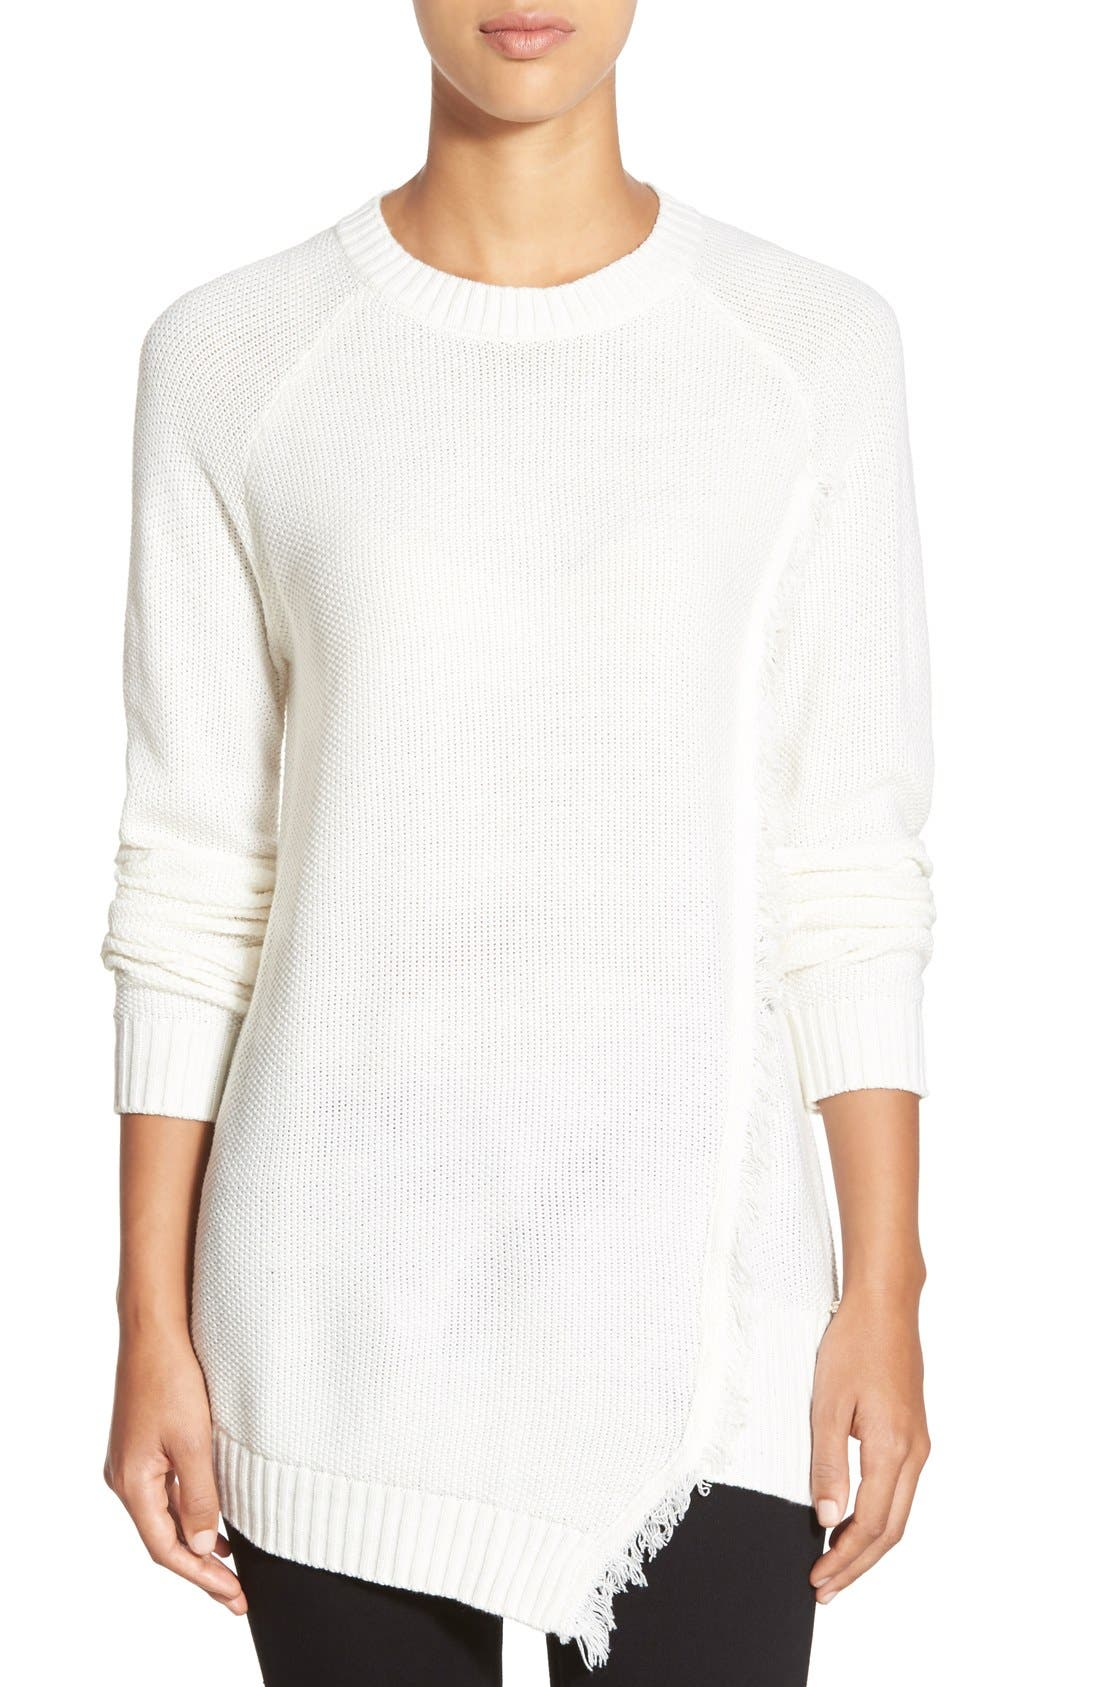 Alternate Image 1 Selected - Ivanka Trump Fringe Trim Asymmetrical Sweater